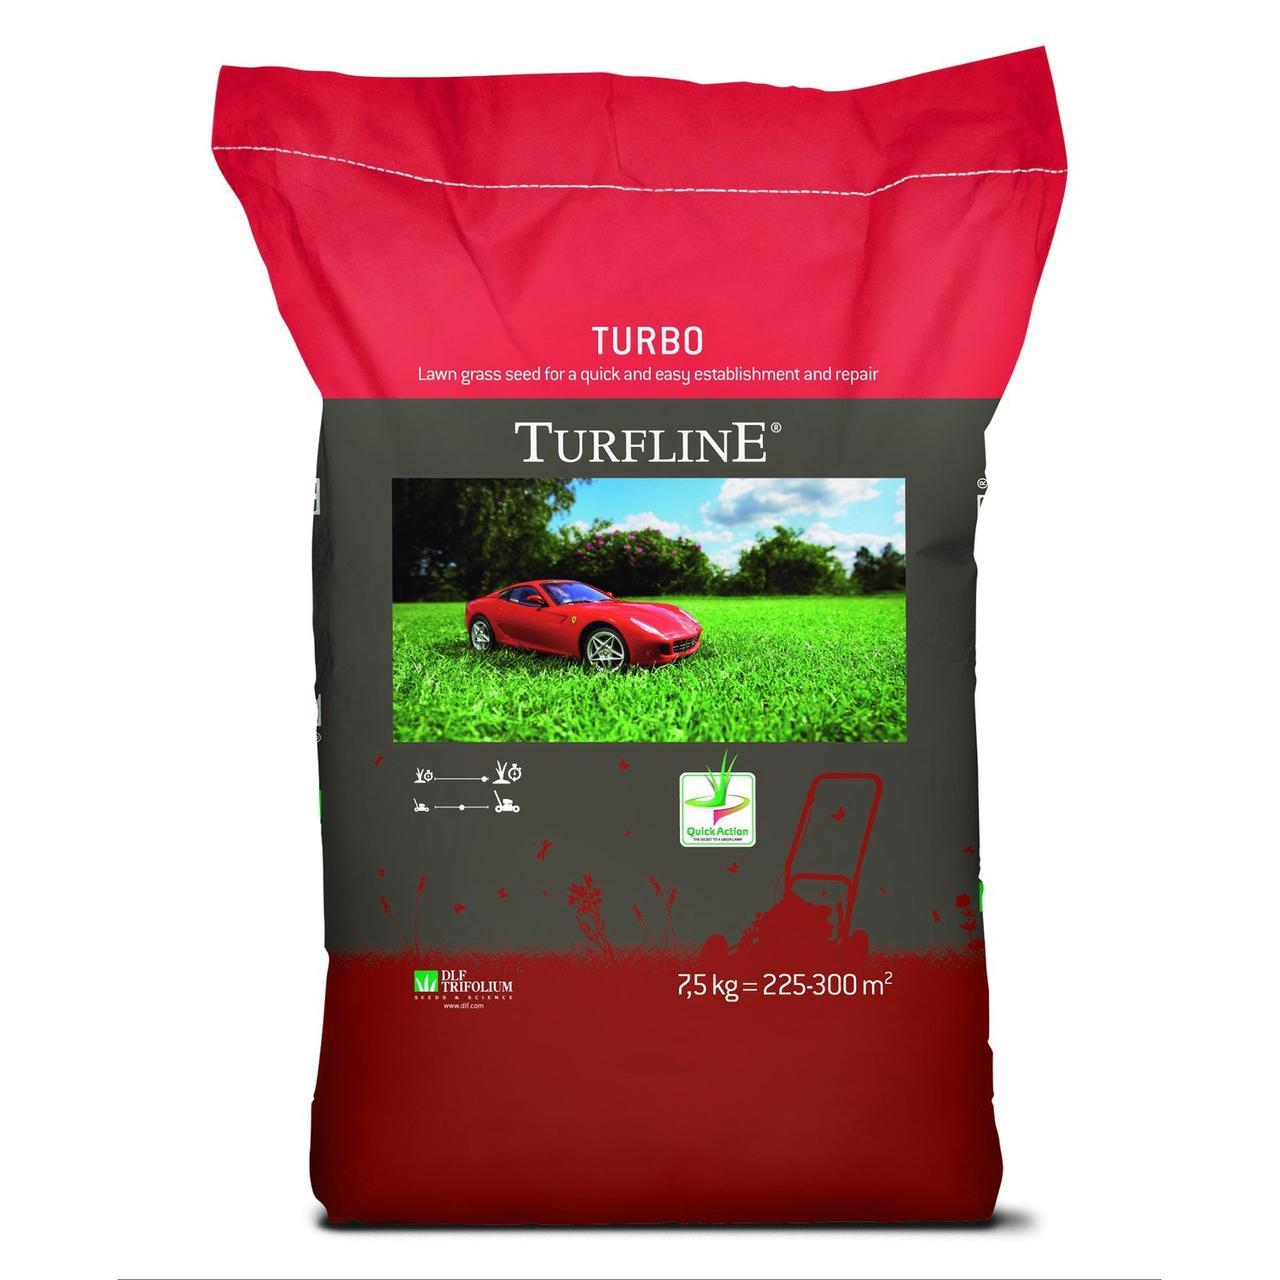 Газонная трава для ремонта и подсева Turfline Турбо / Turbo, DLF Trifolium - 7,5 кг